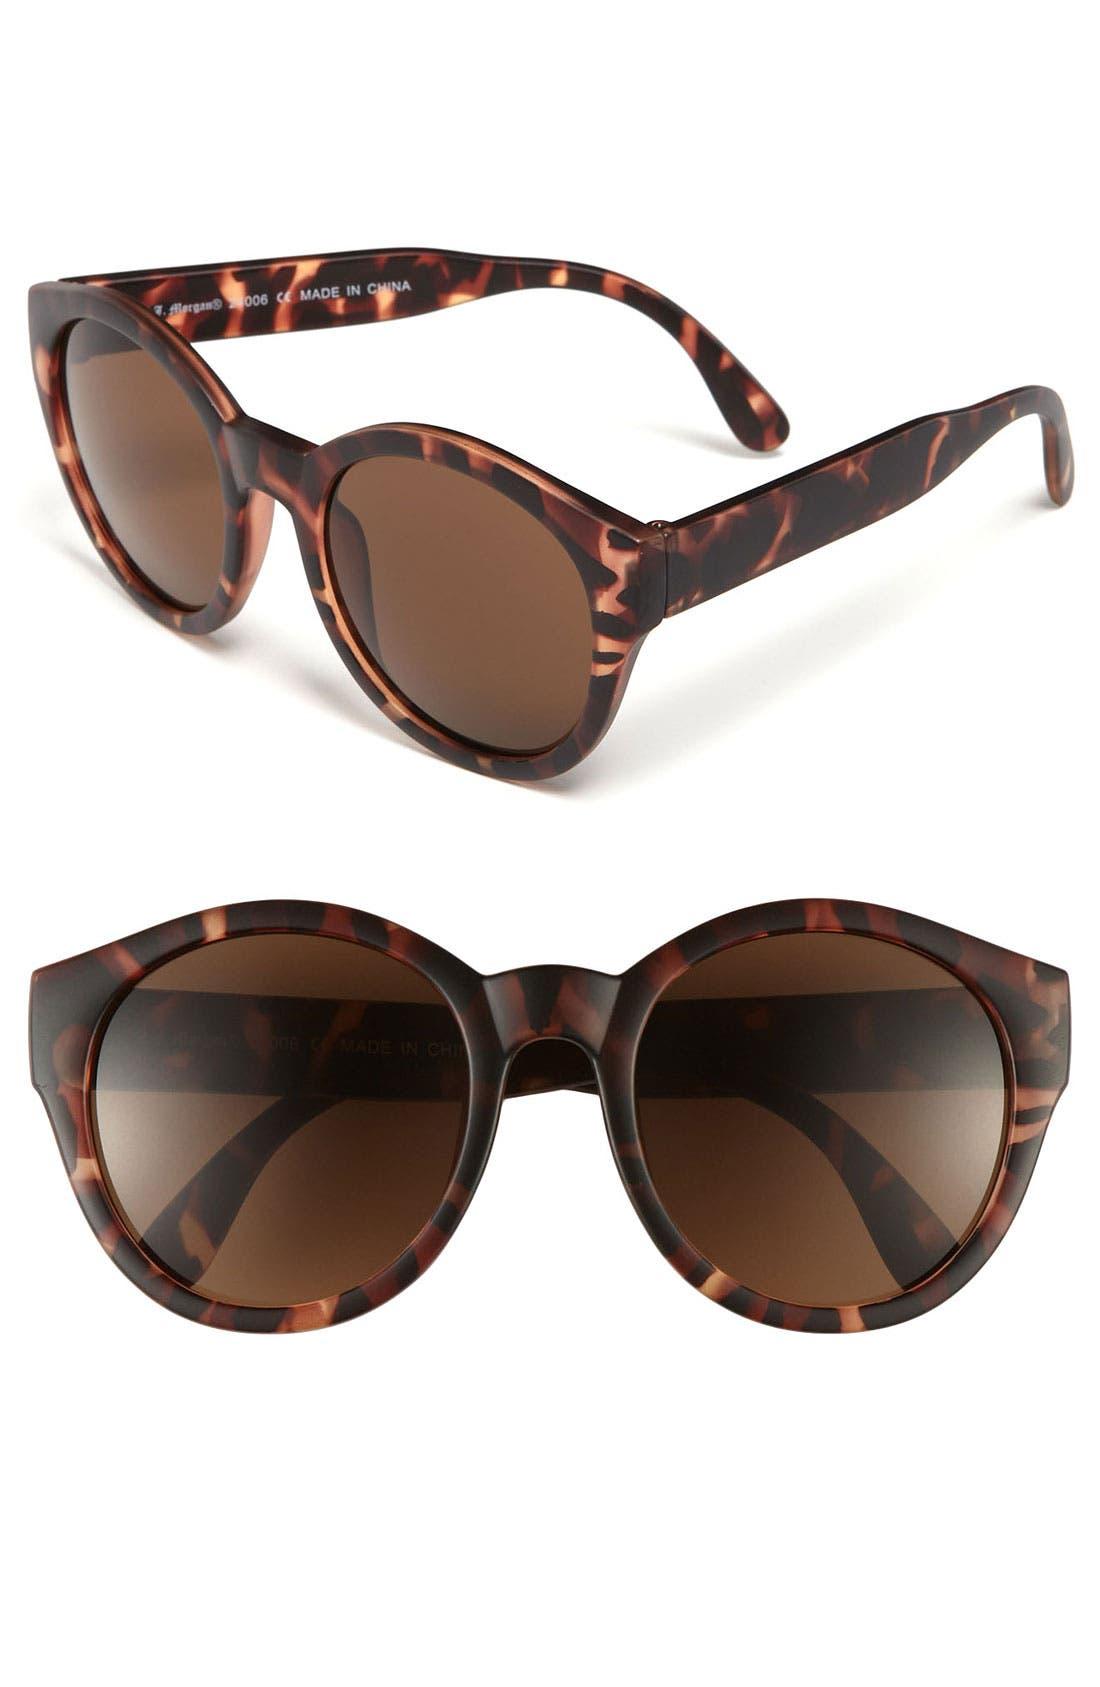 Alternate Image 1 Selected - A.J. Morgan 53mm 'Miss Brooks' Retro Sunglasses